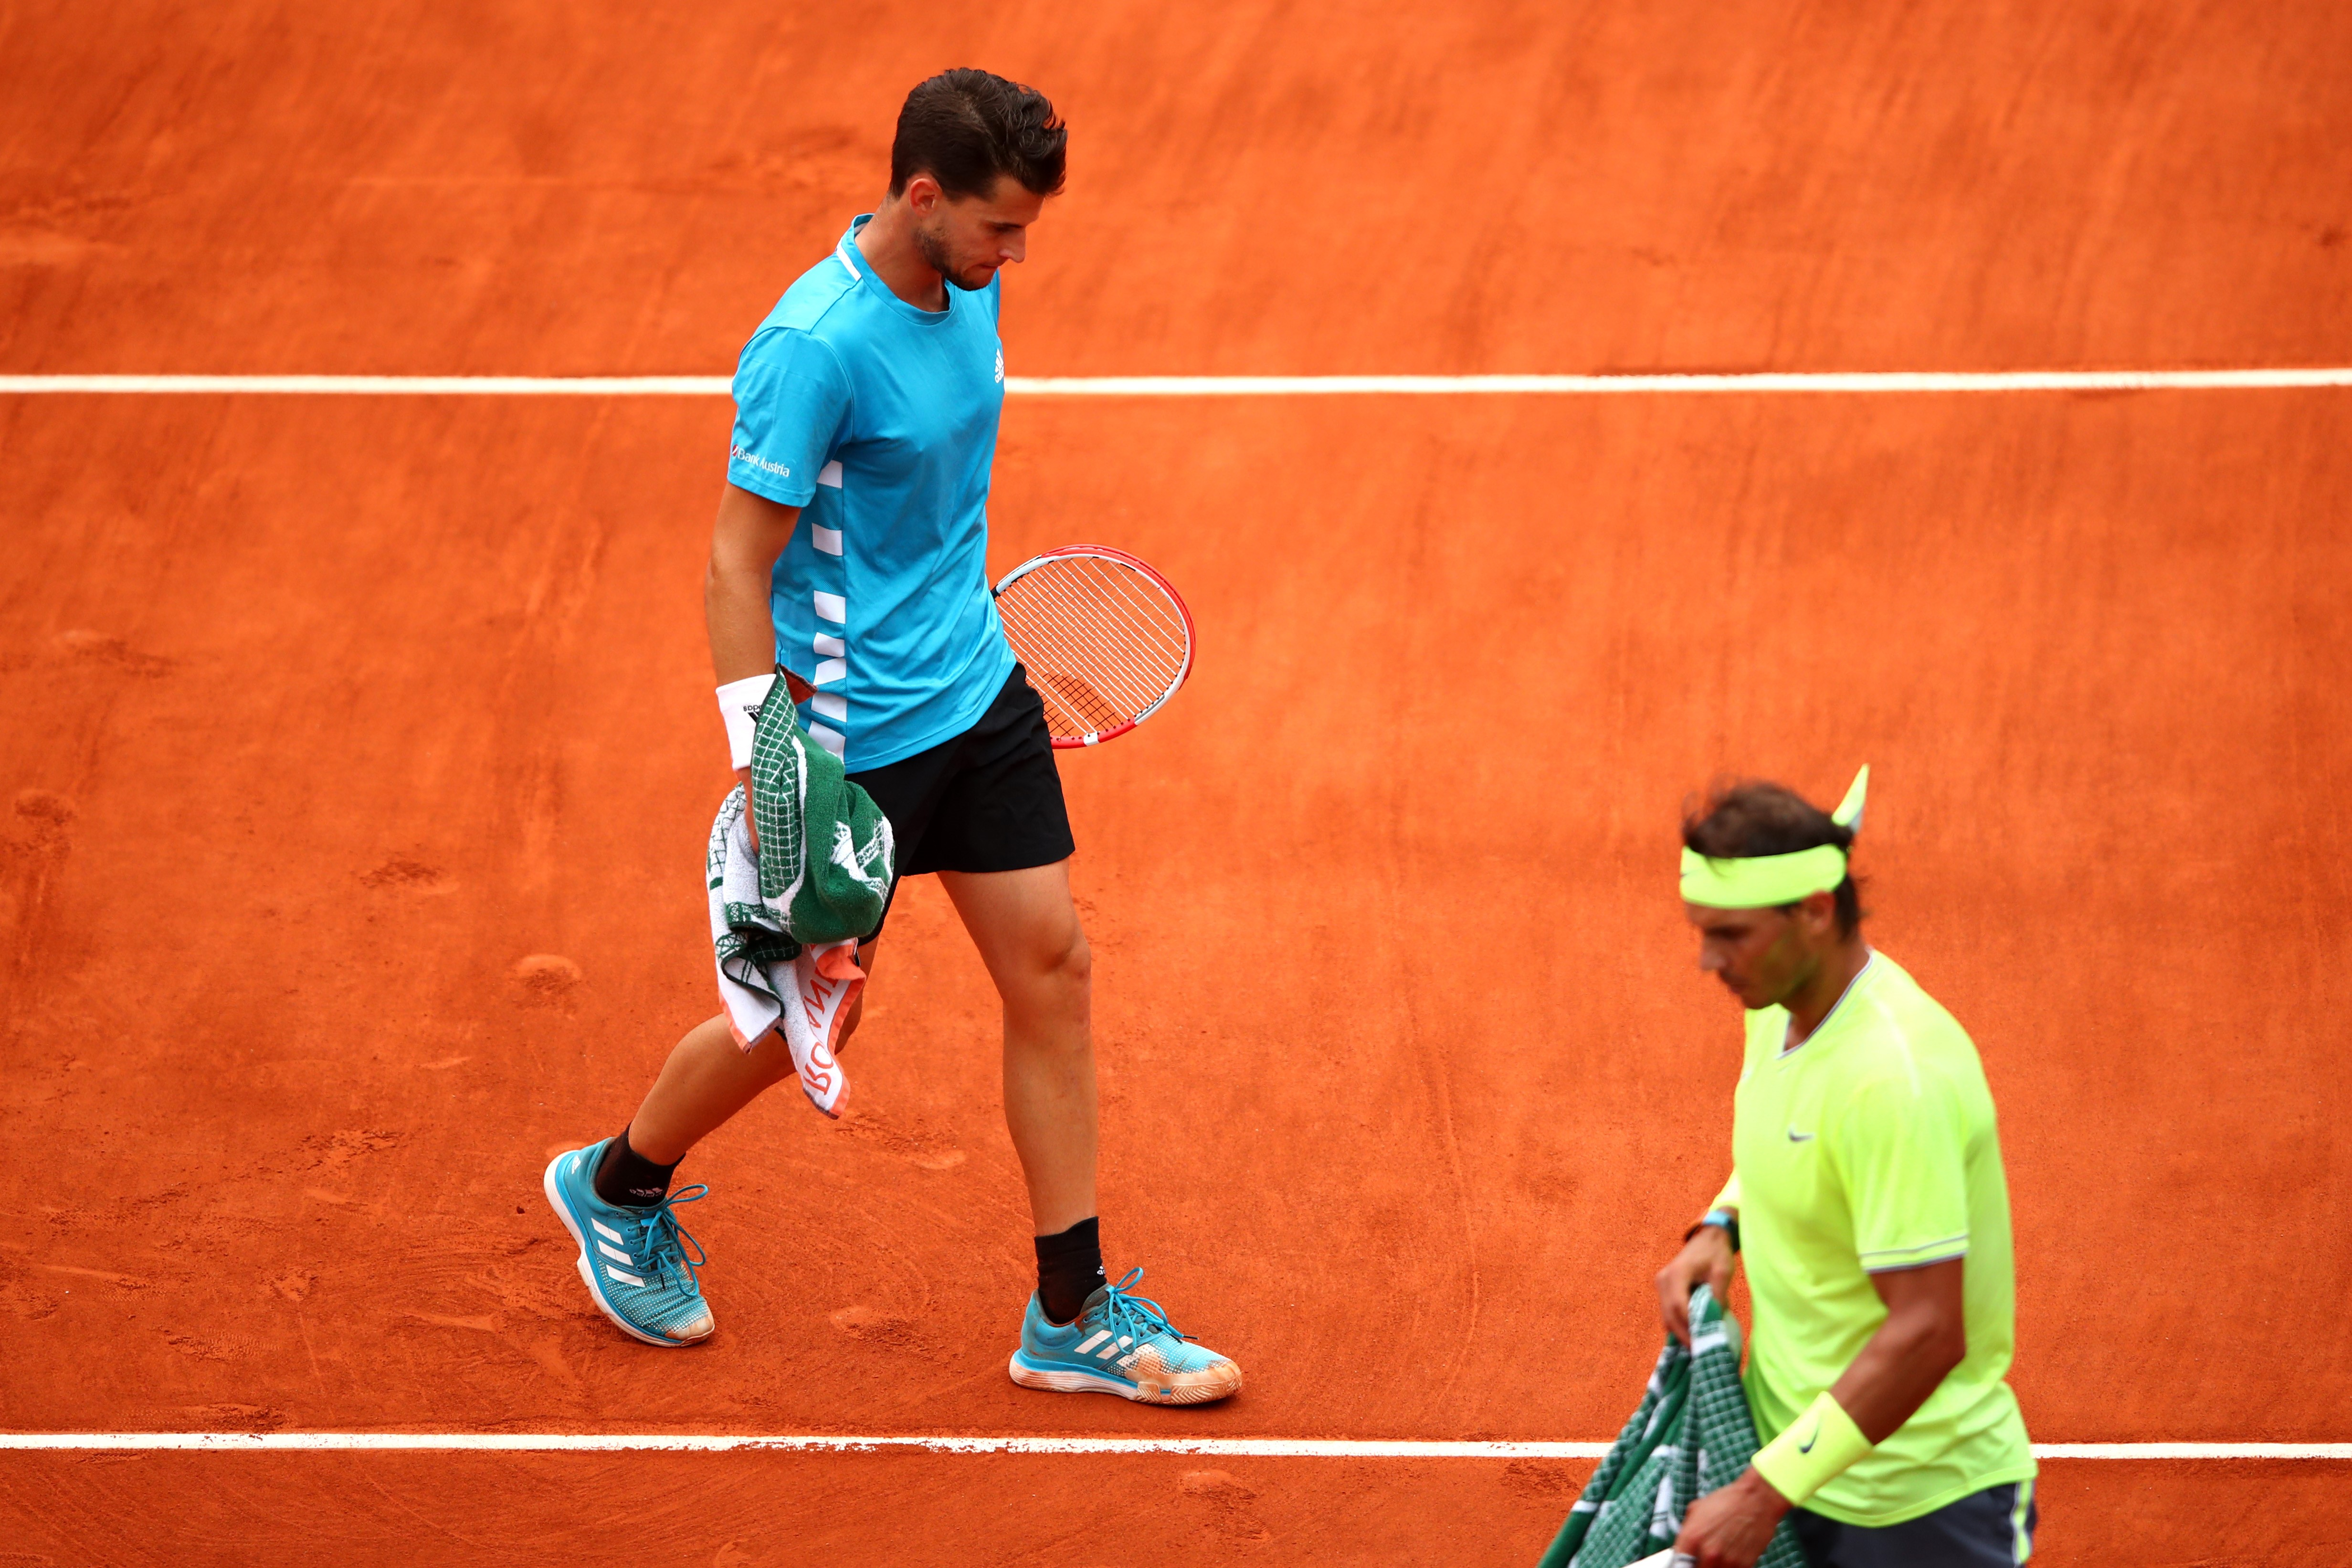 Rafael Nadal- Dominic Thiem (2019 Roland-Garros)